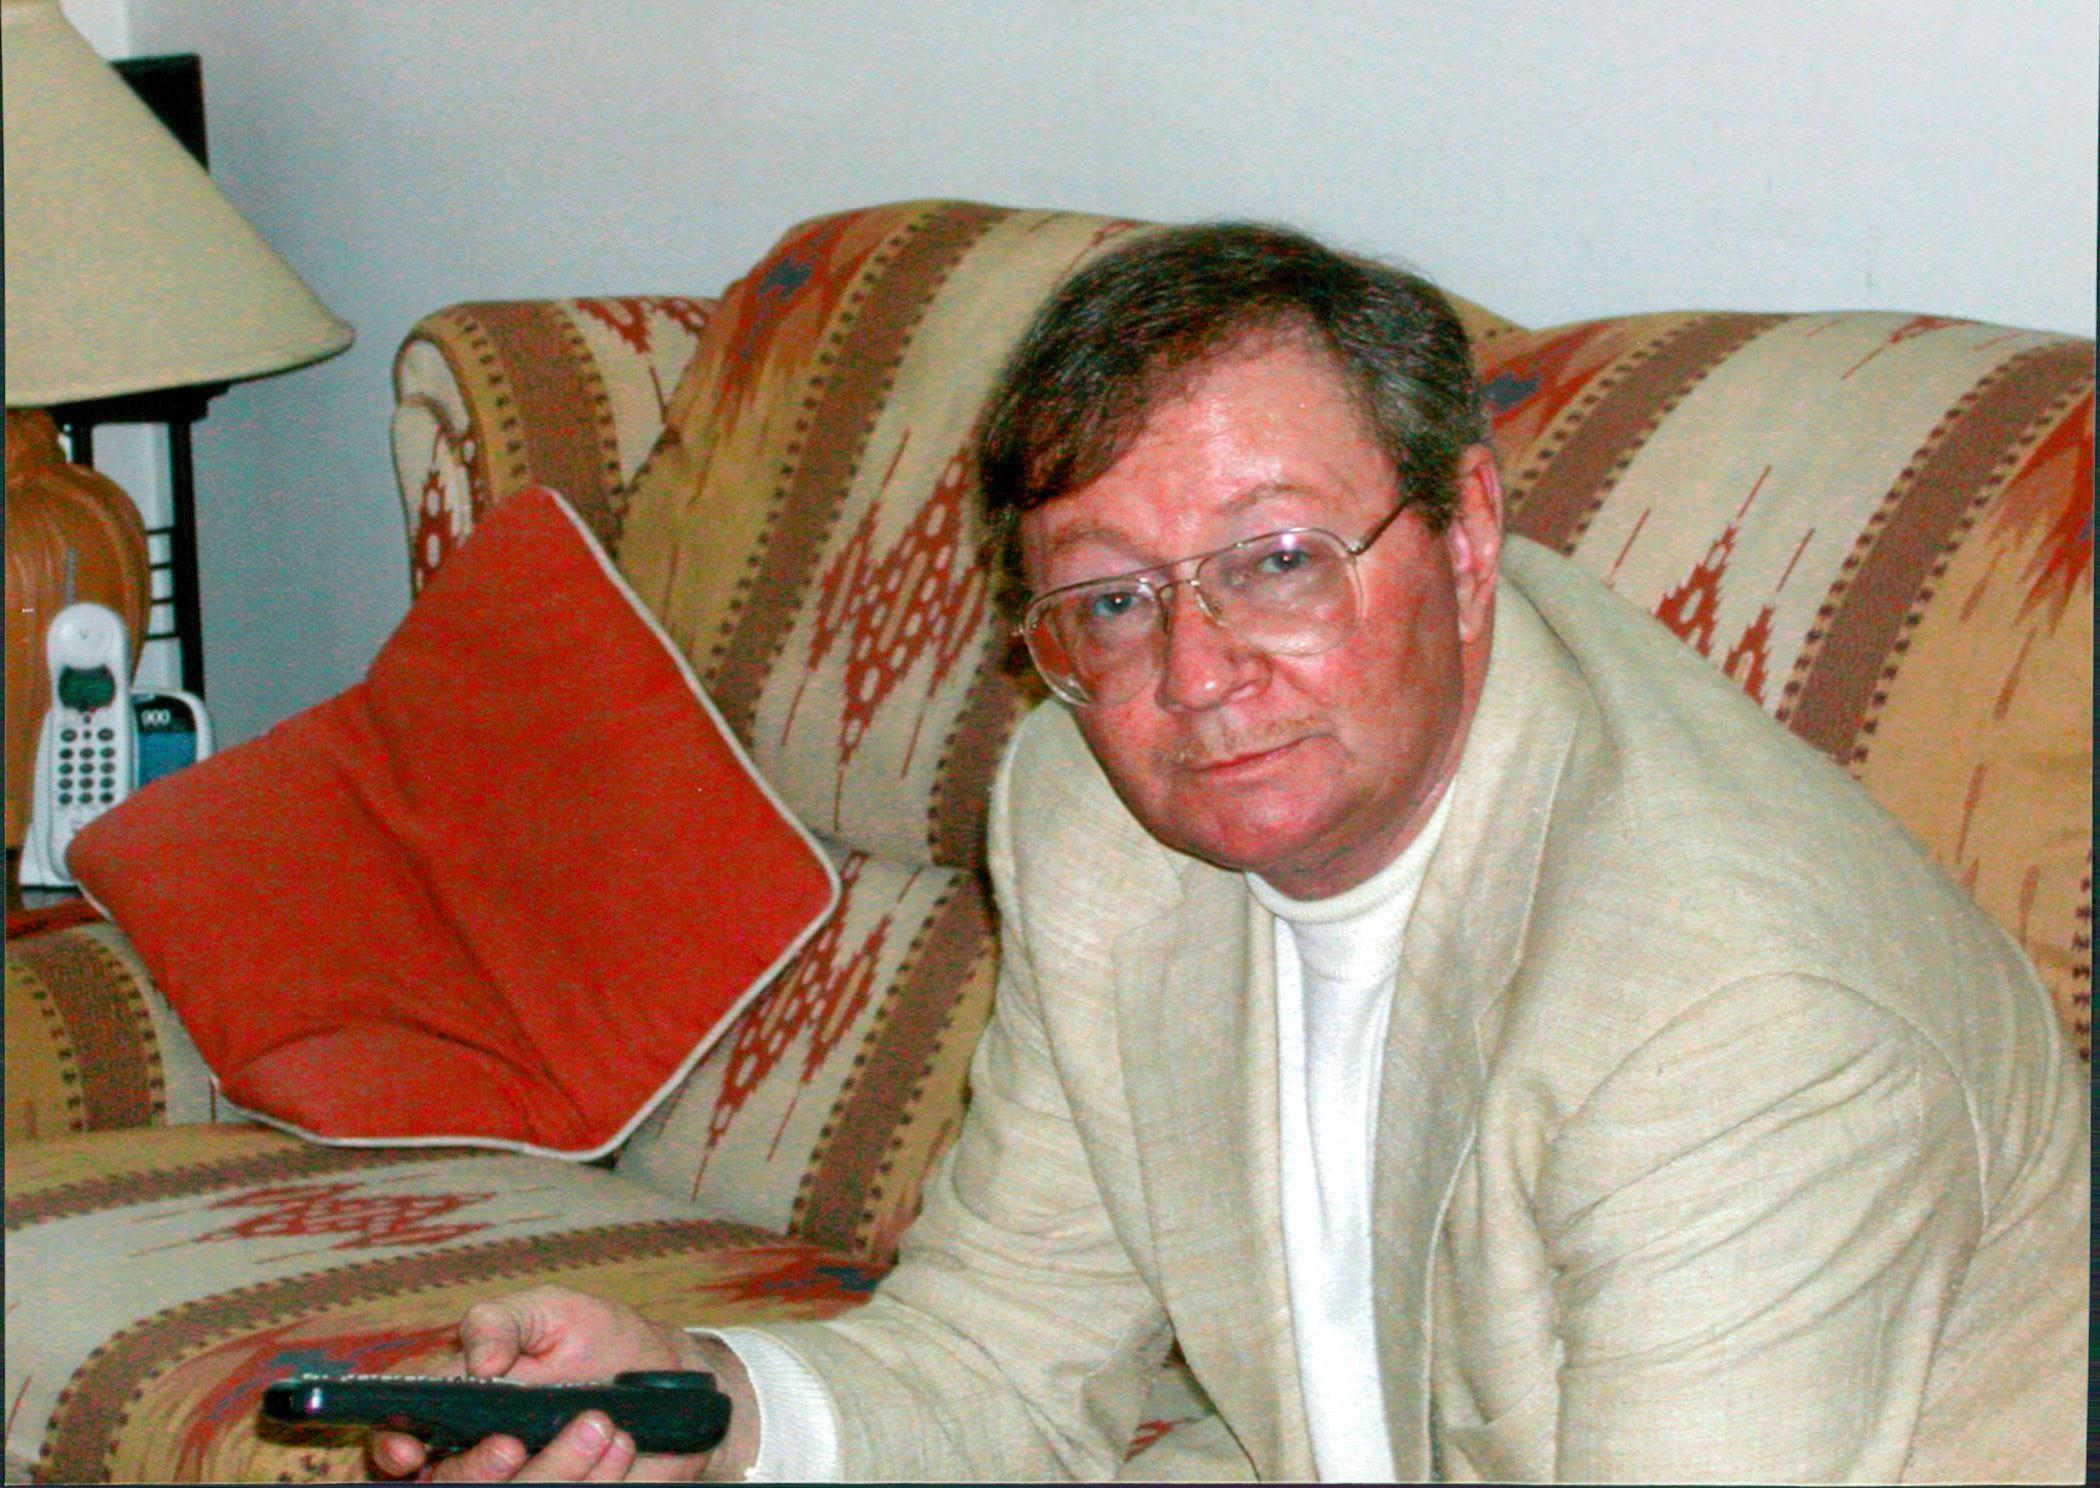 Dennis George Long